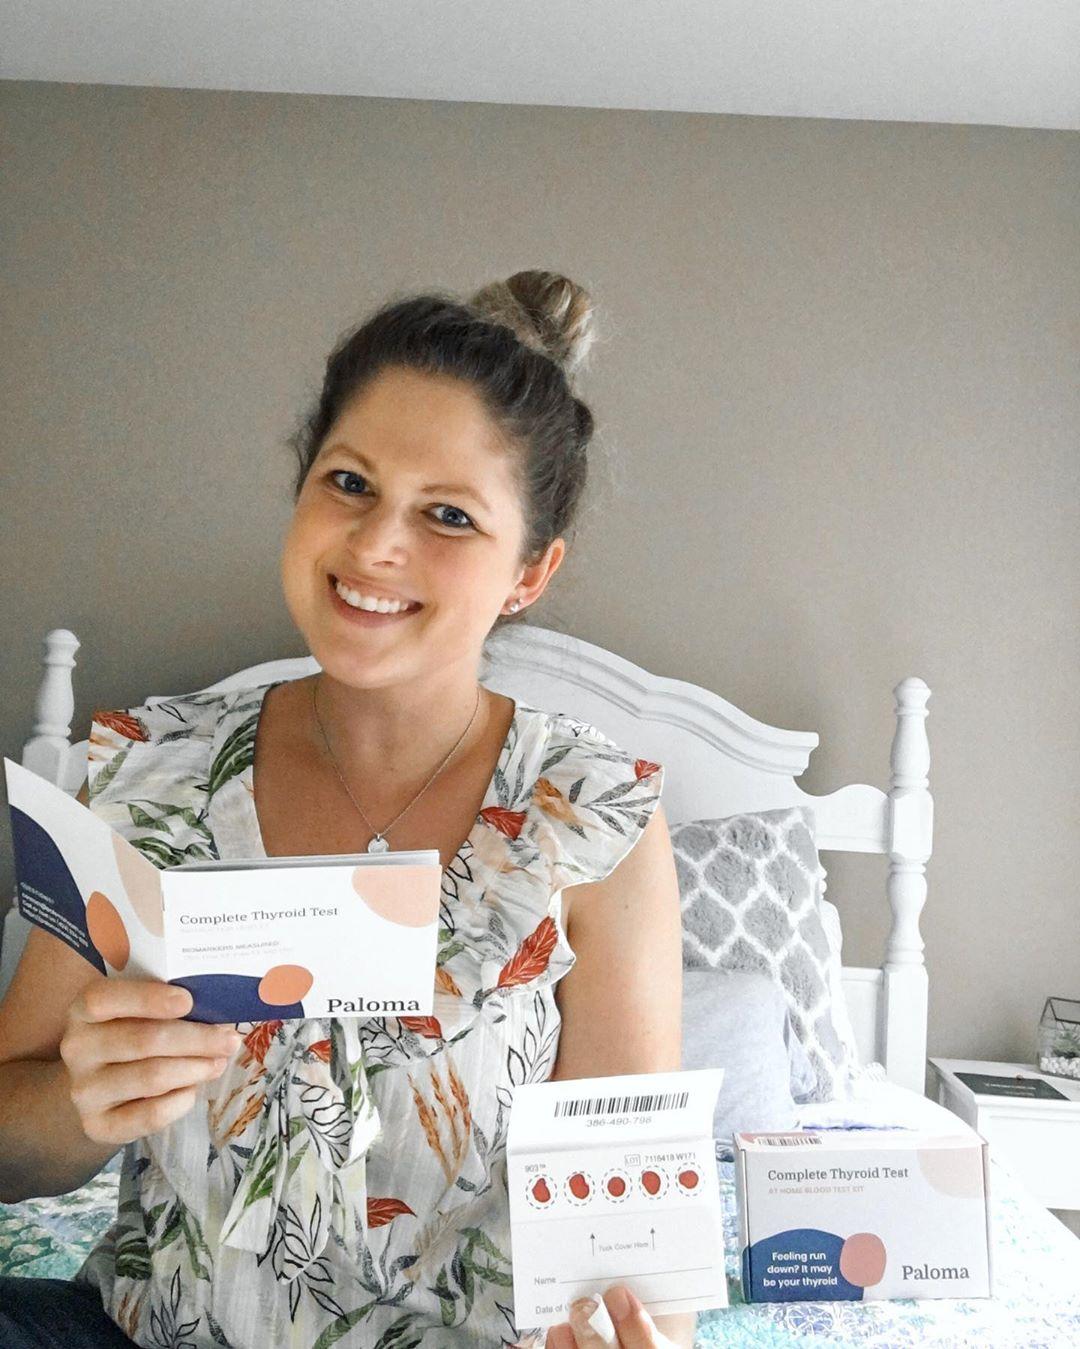 at home hashimoto's blood test kit